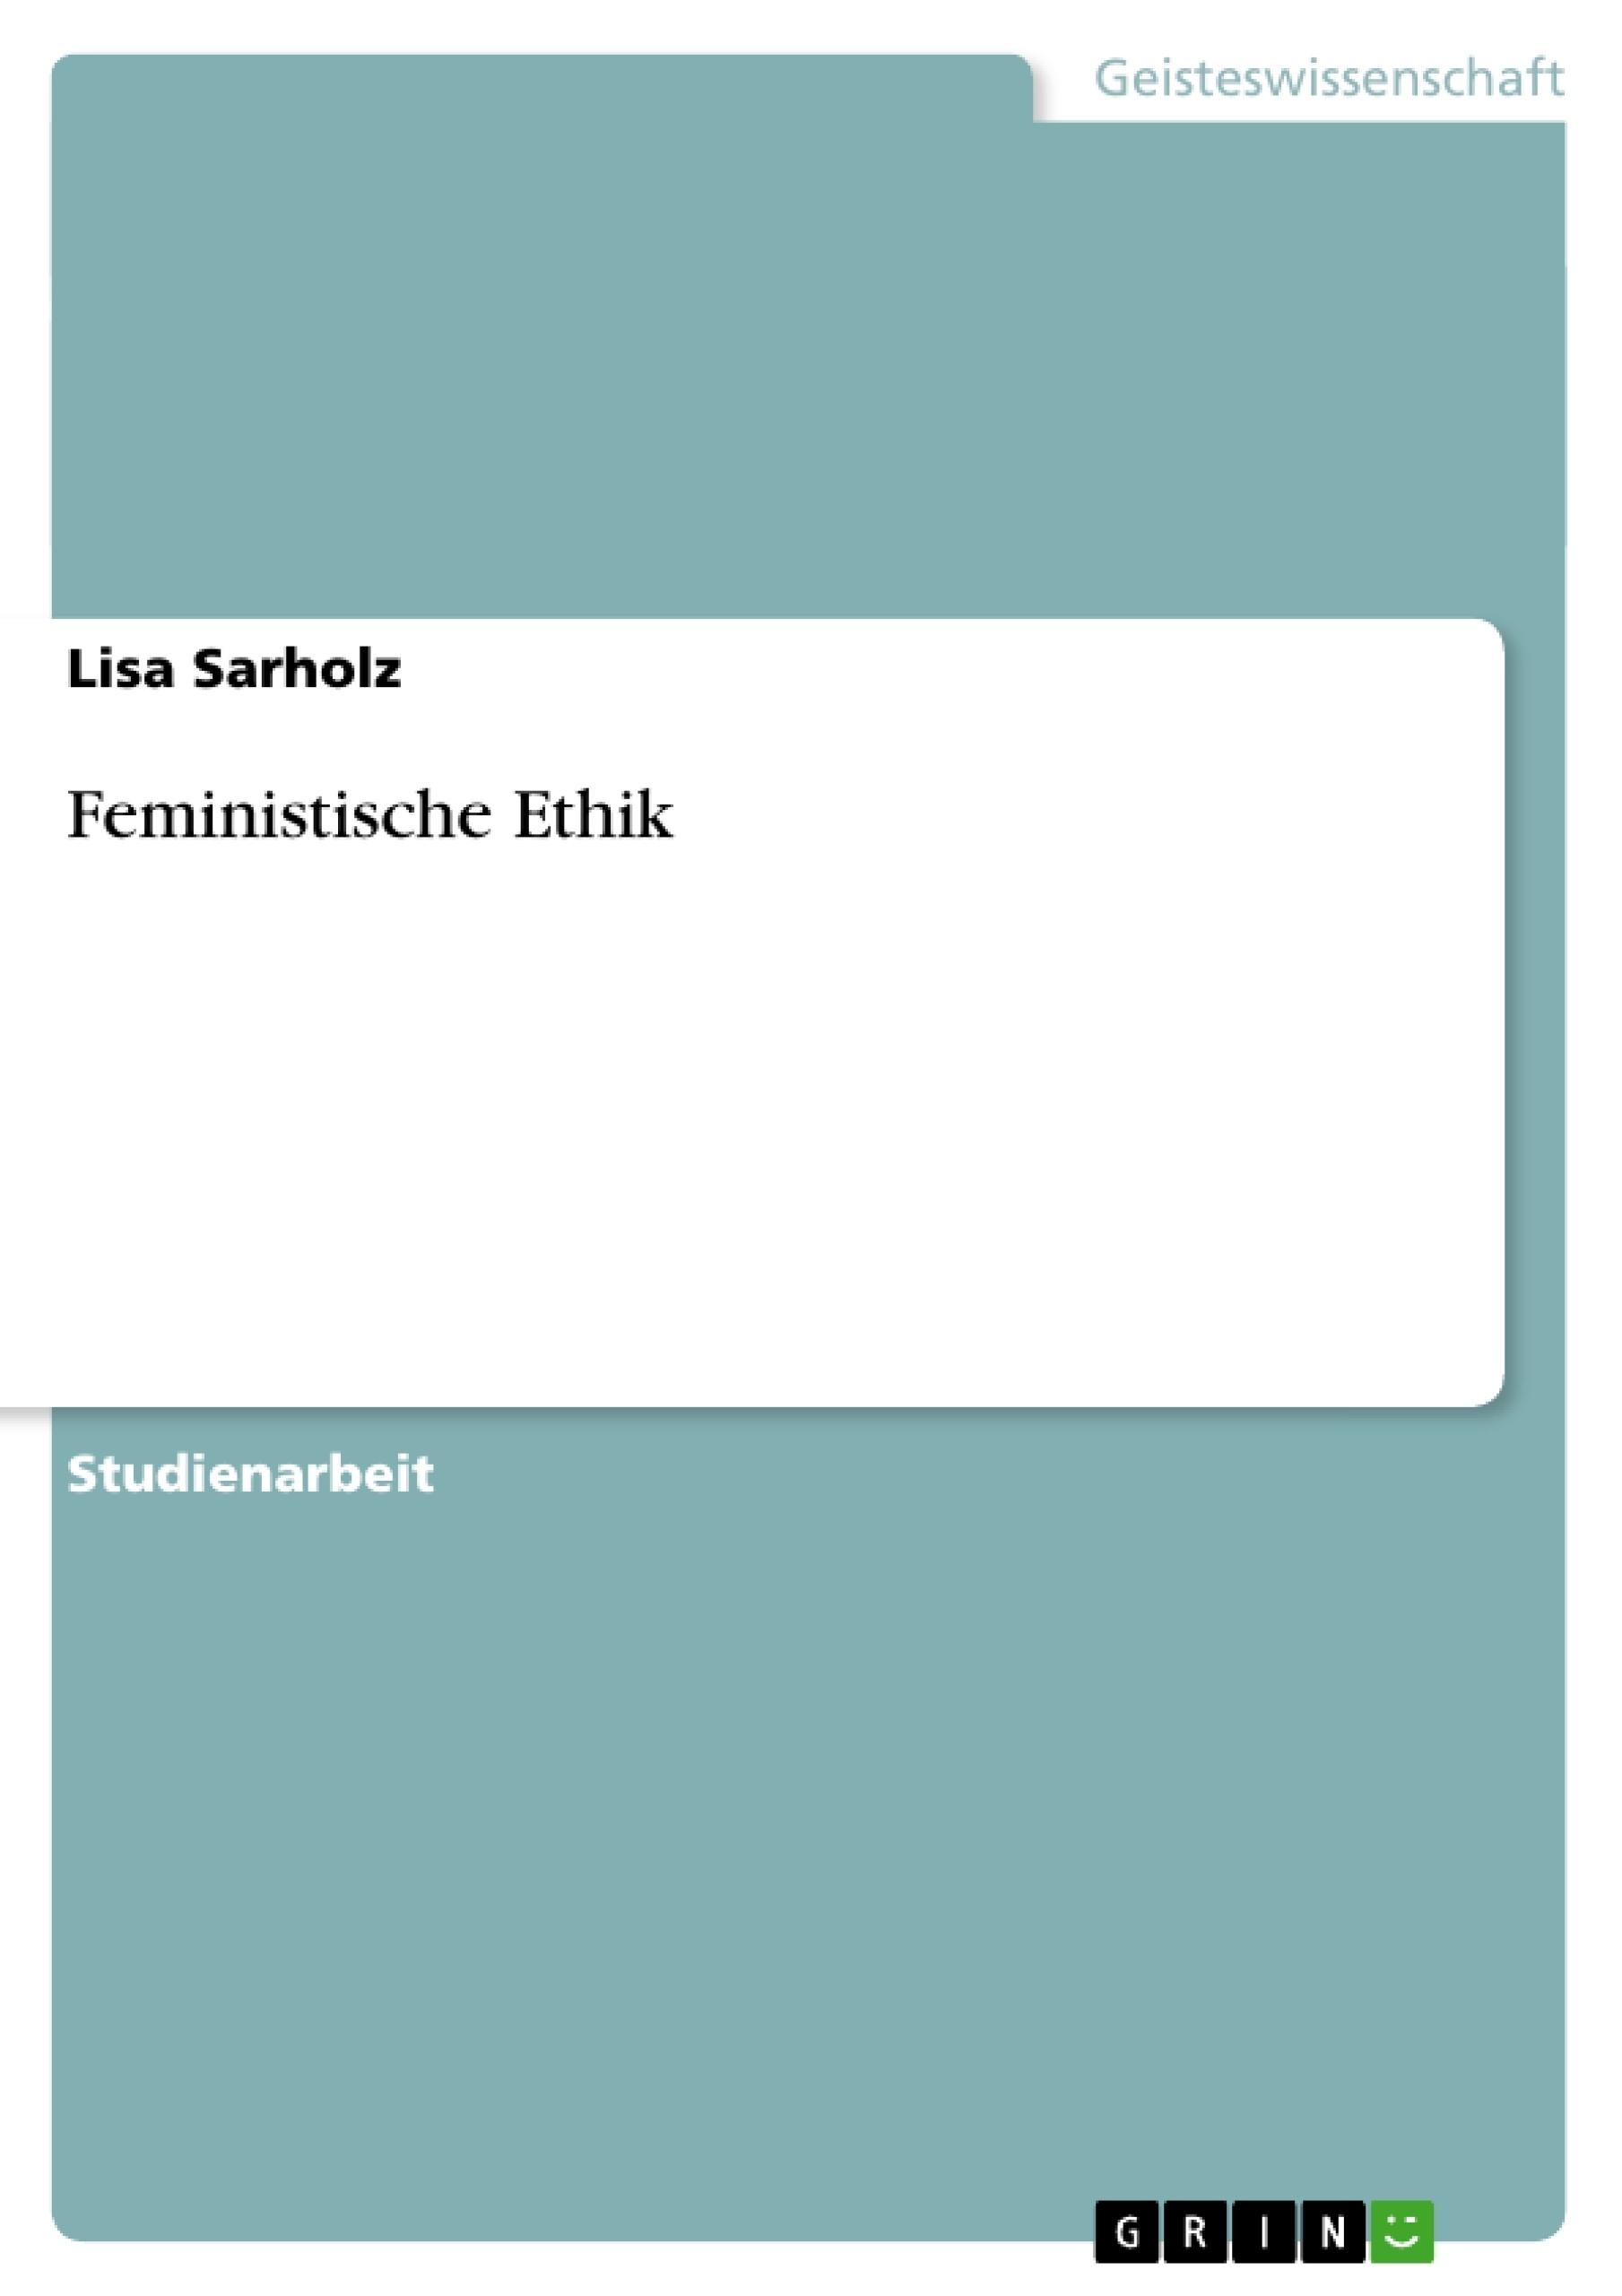 Titel: Feministische Ethik